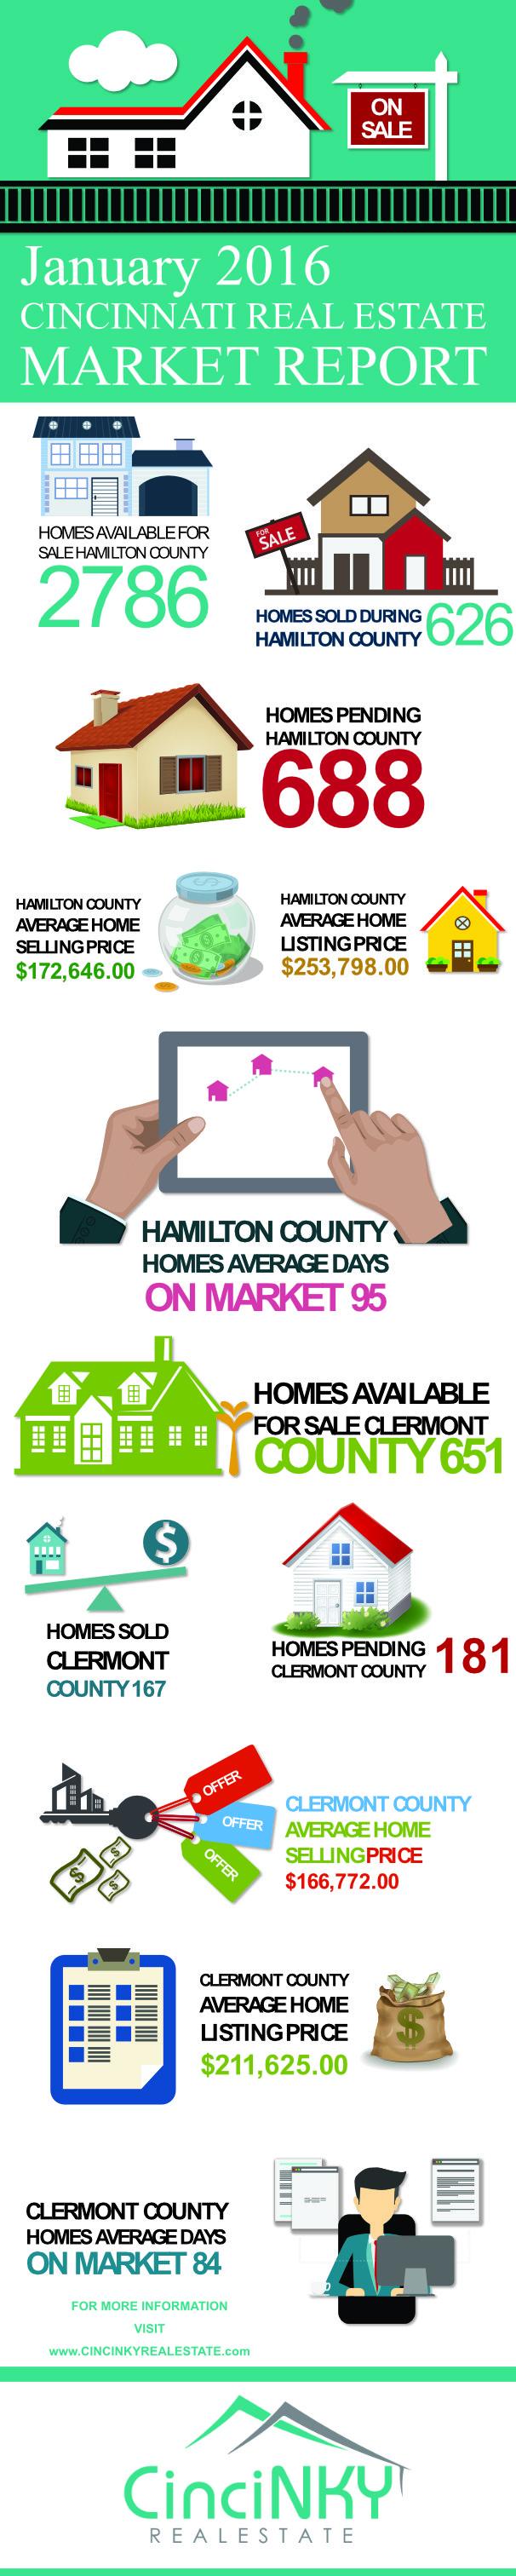 January 2016 Cincinnati Real Estate Market Report